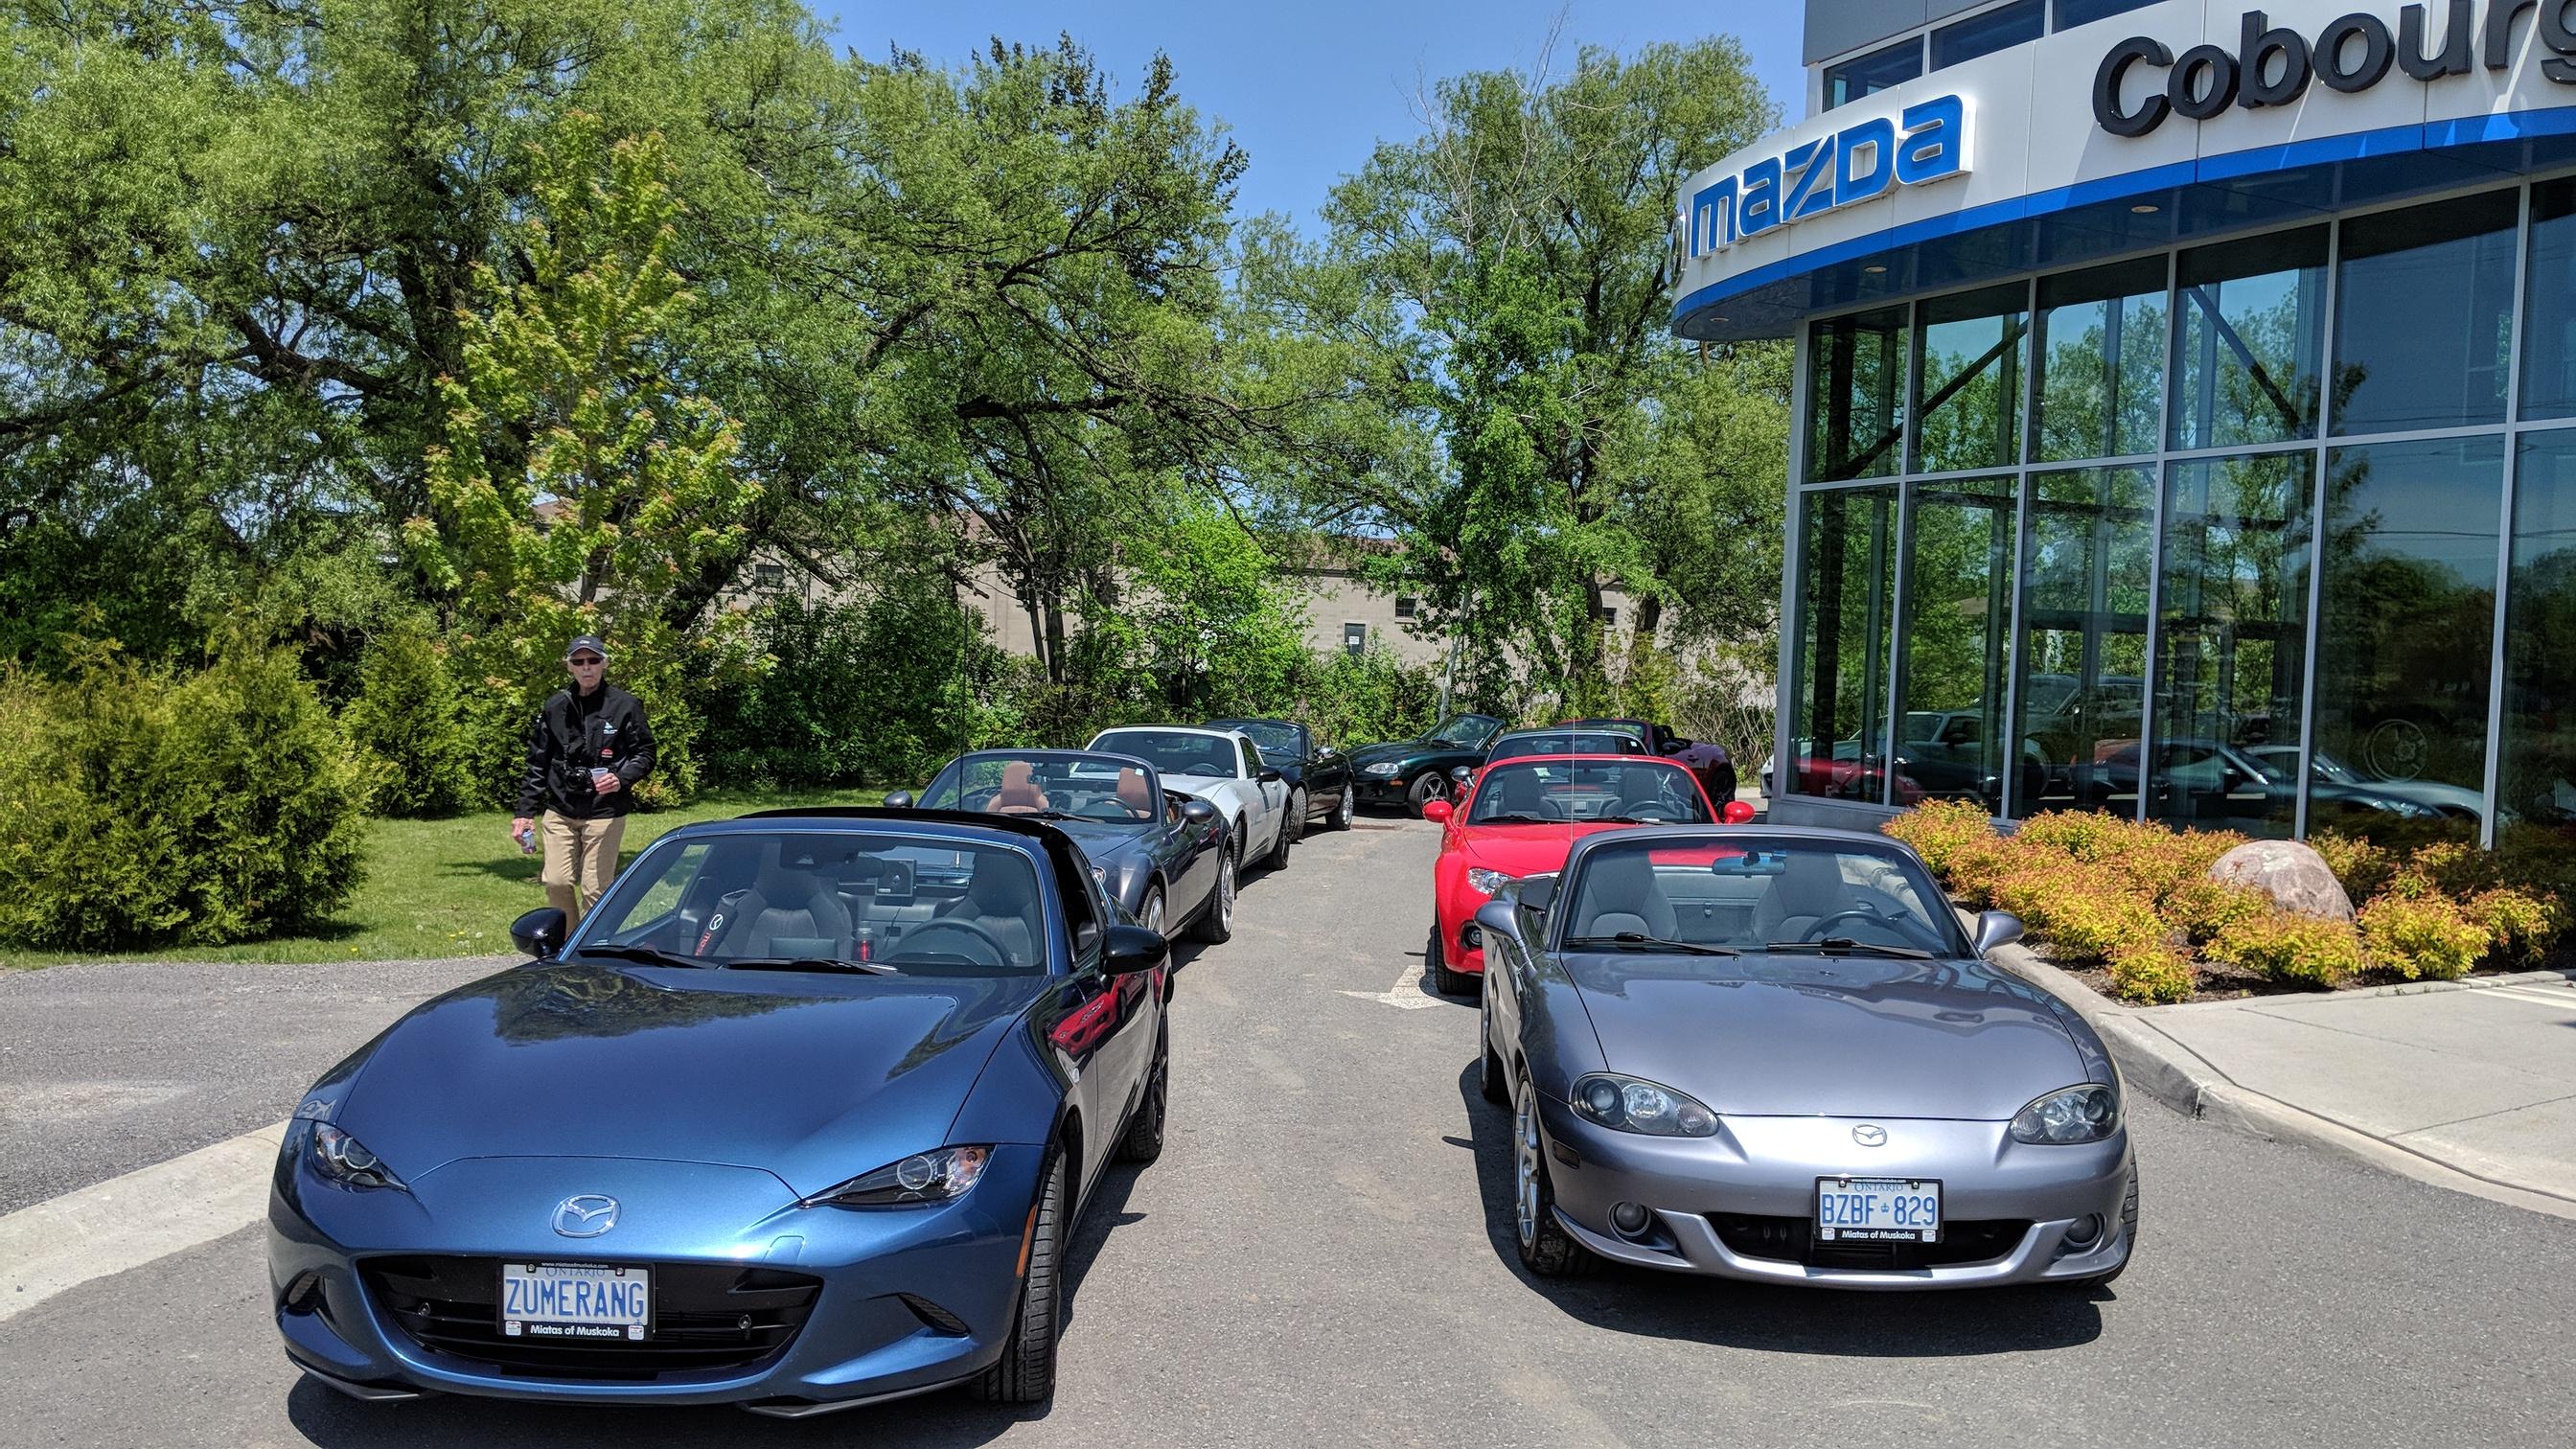 Cobourg Mazda 2019 (20)